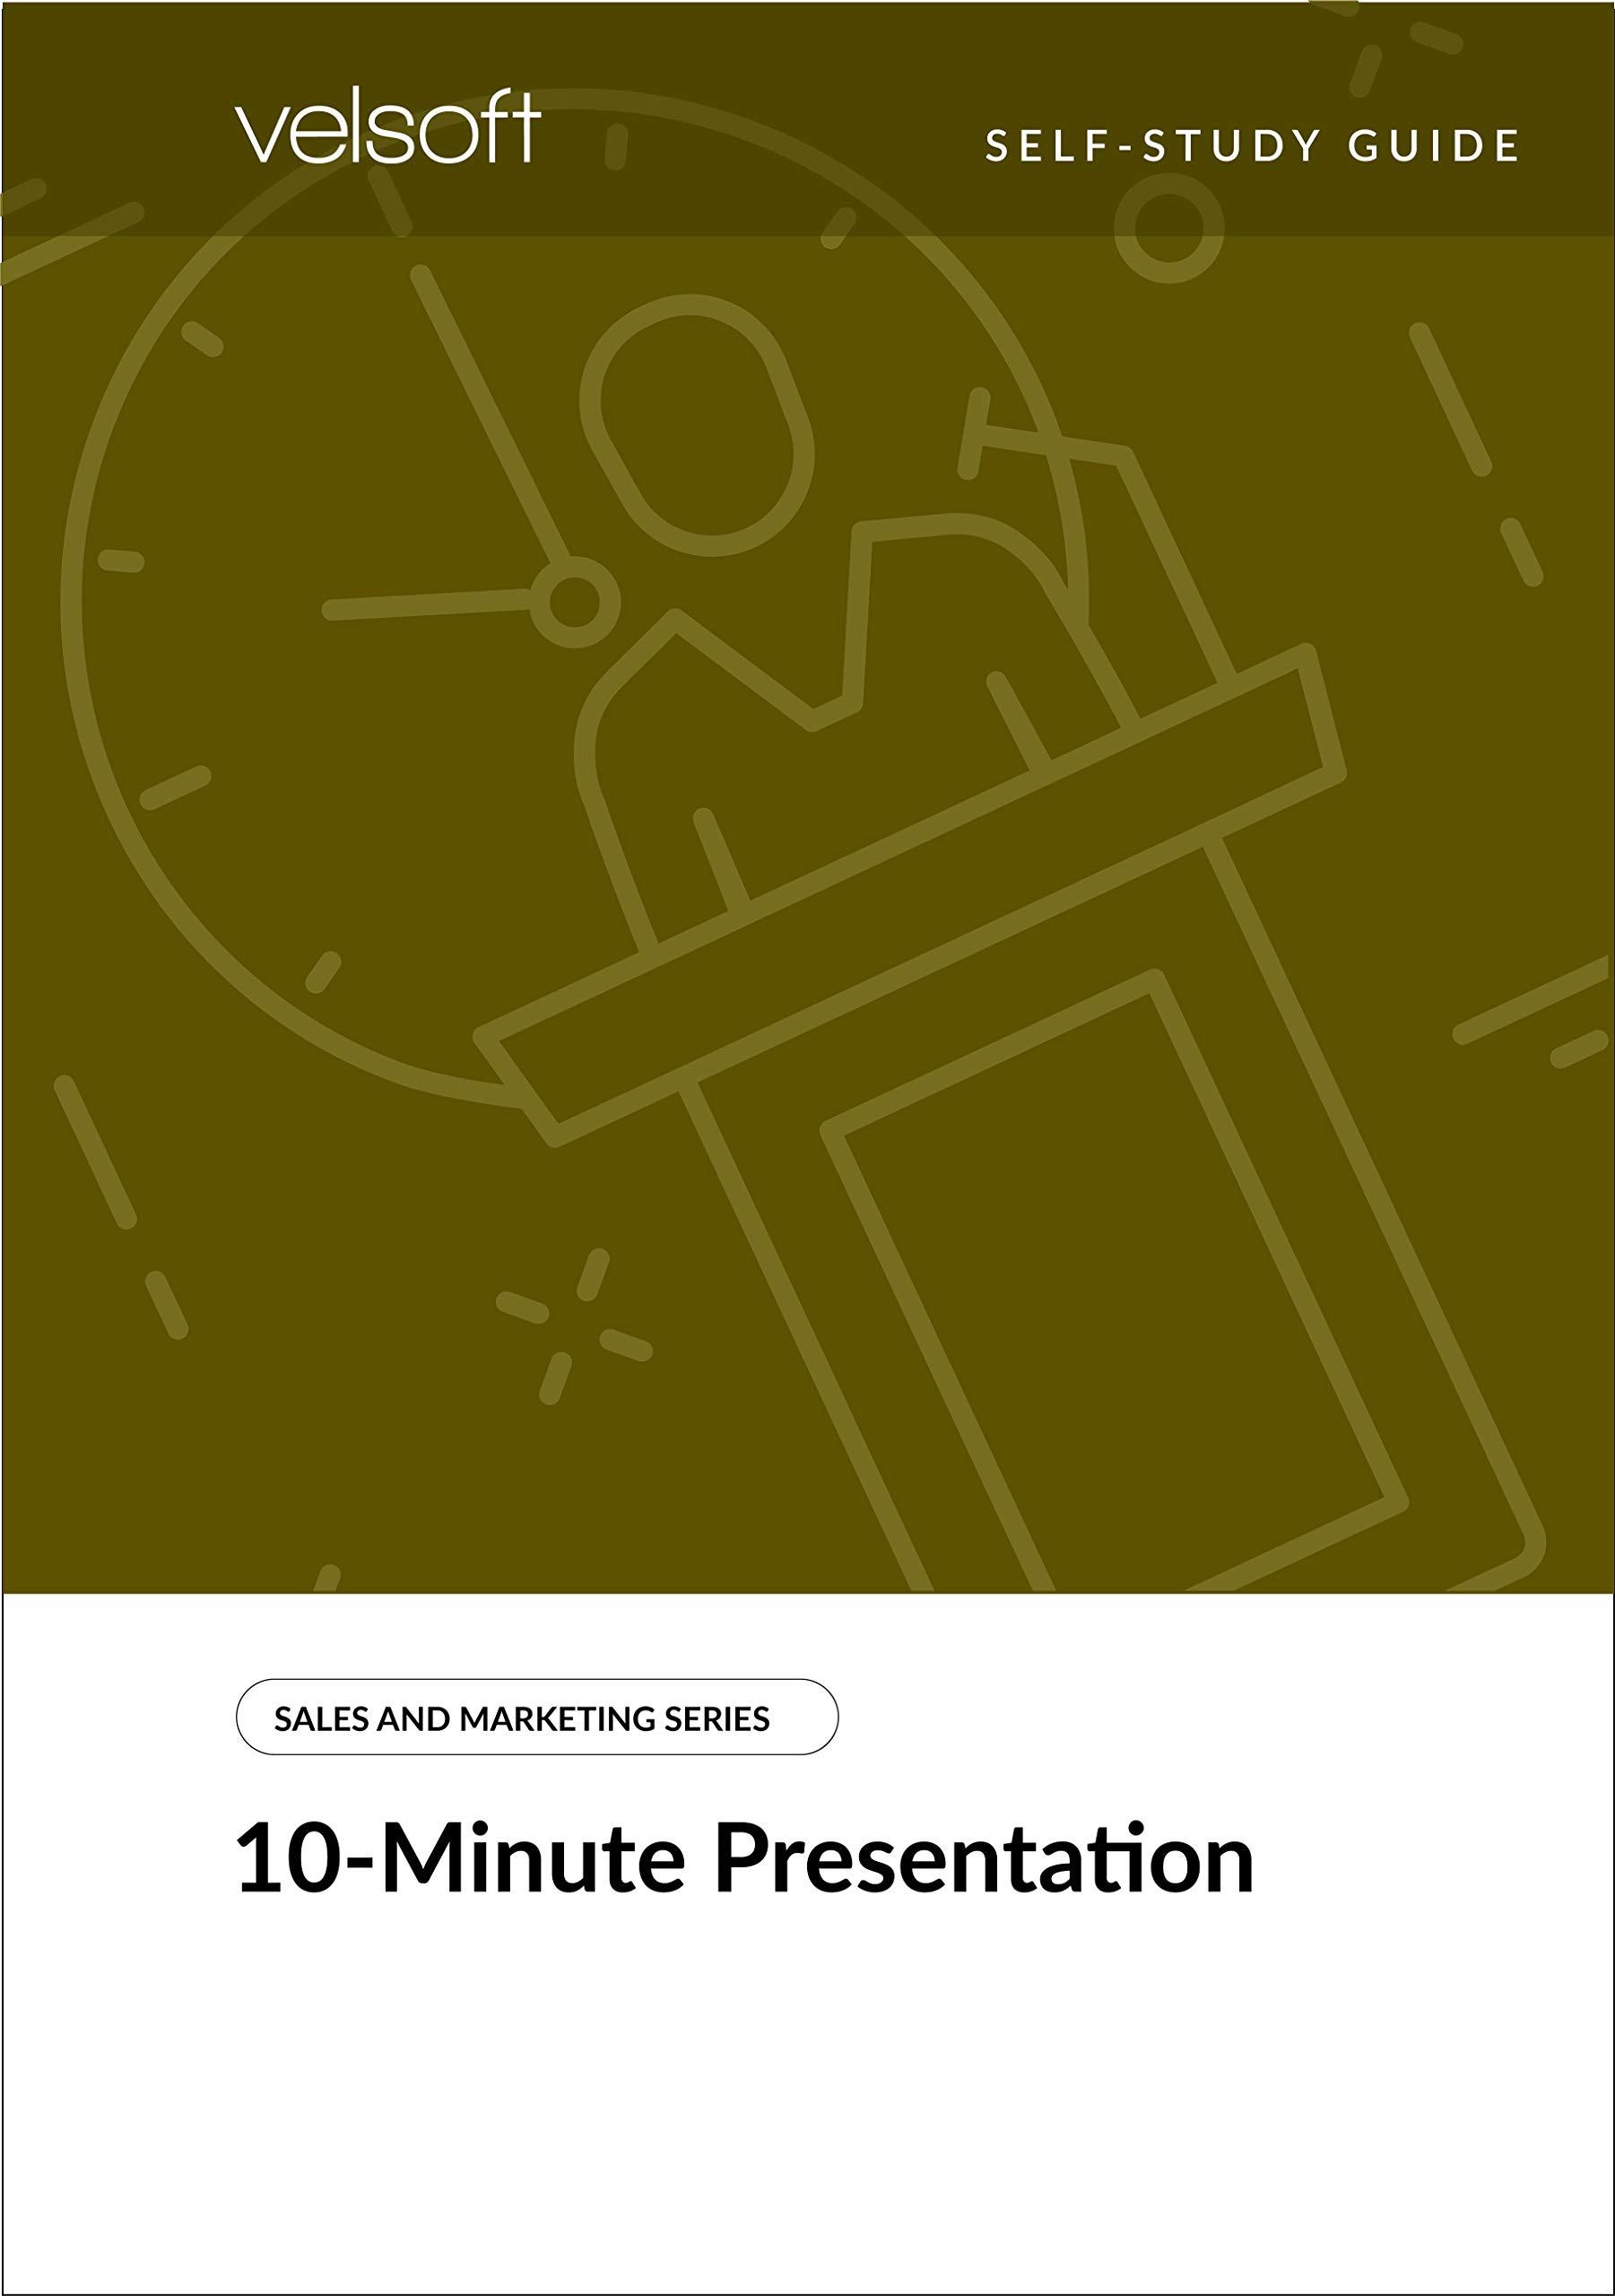 10-Minute Presentations (SELF-STUDY GUIDE)